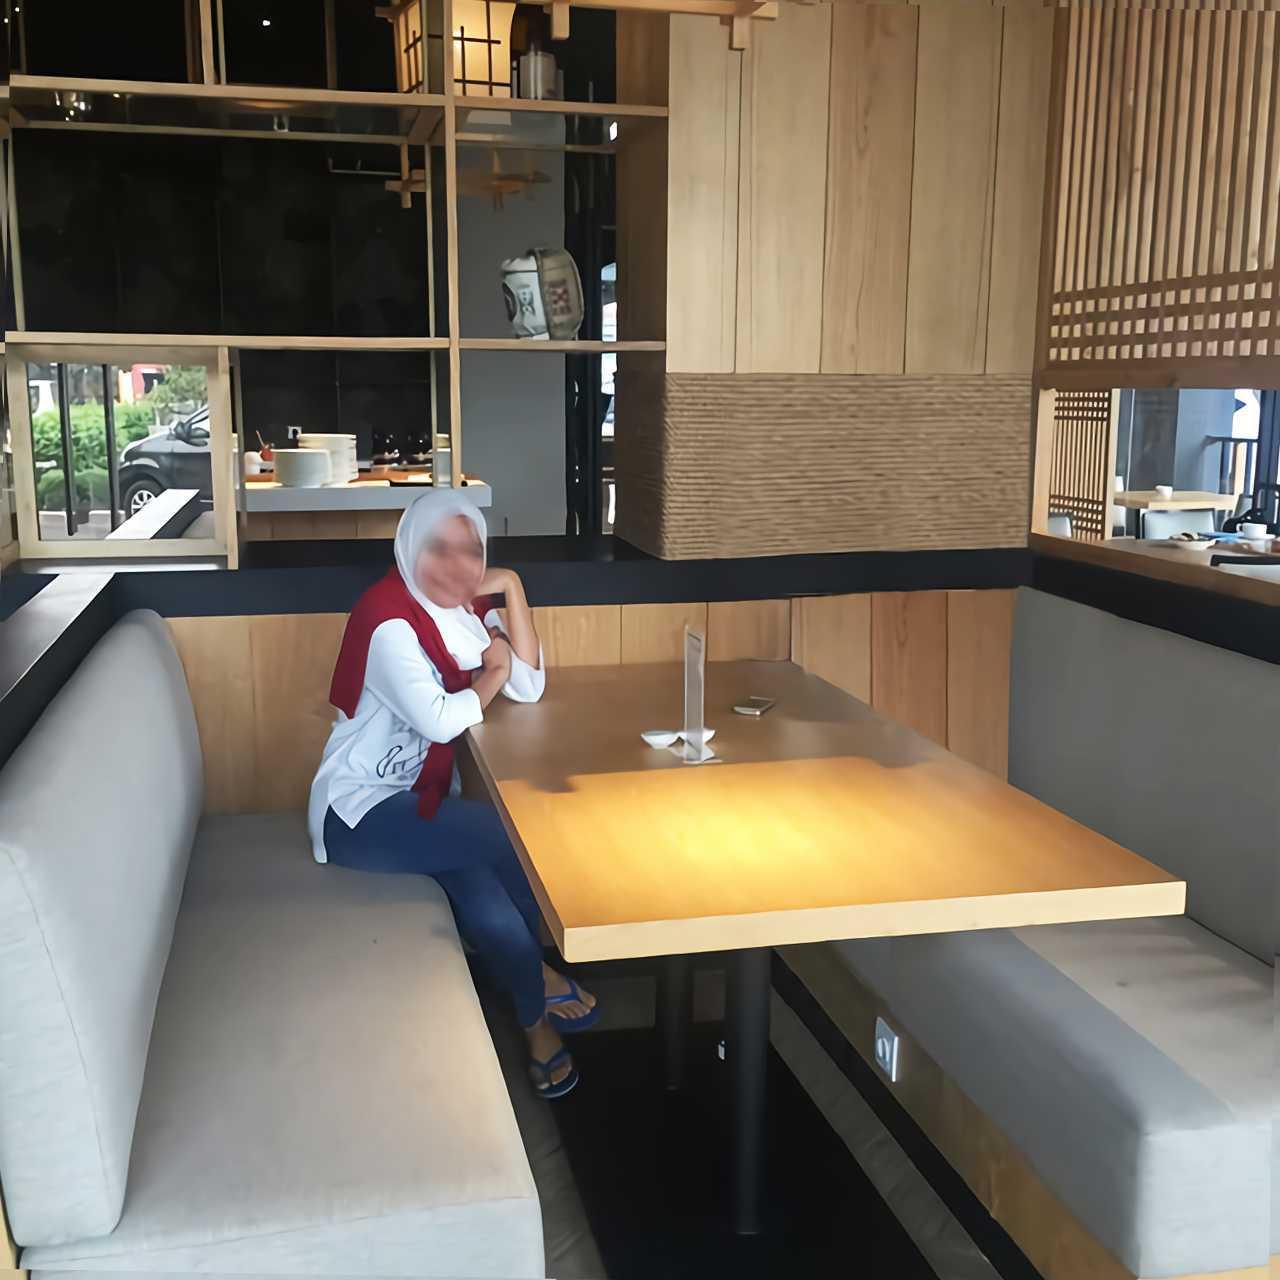 Pt Alradista Desain Indonesia Japanese Restaurant, Cikarang Cikarang, Bekasi, Jawa Barat, Indonesia Cikarang, Bekasi, Jawa Barat, Indonesia Dining Area   46563